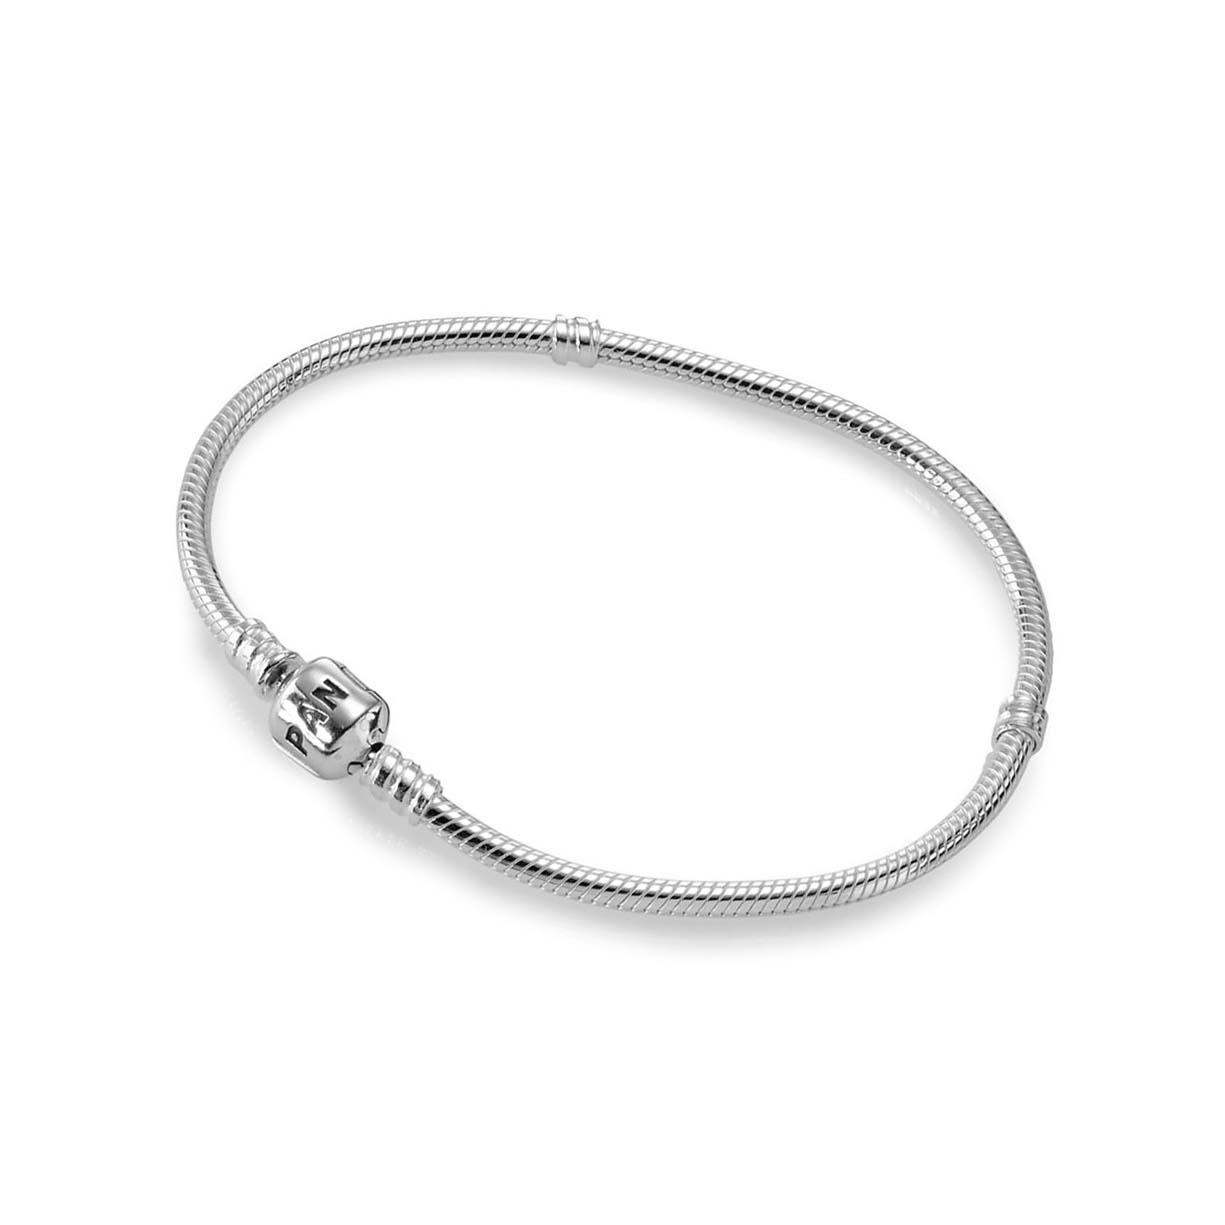 bijou pandora bracelet charm